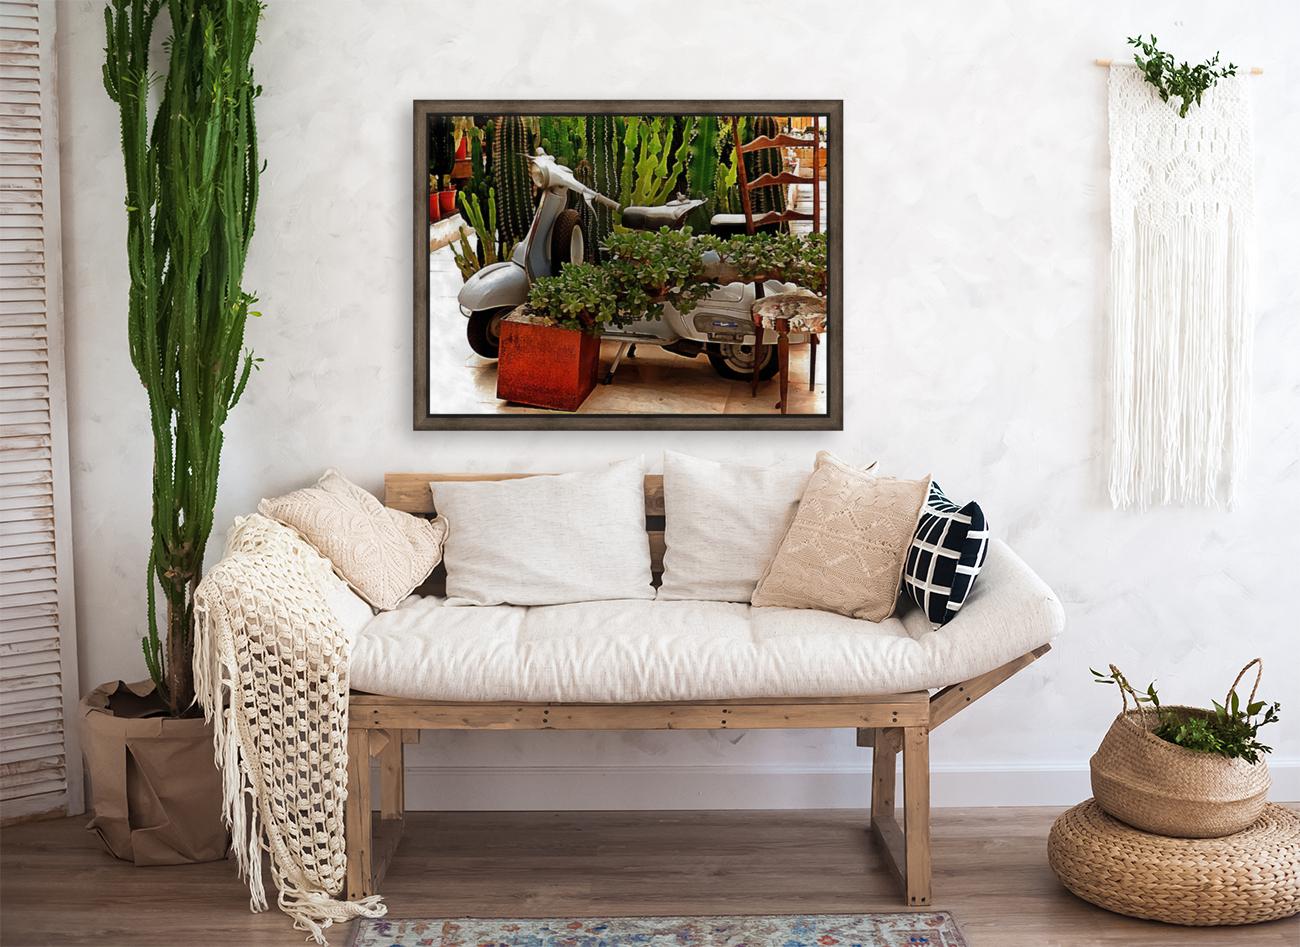 Vespa As Part Of Succulent Display  Art